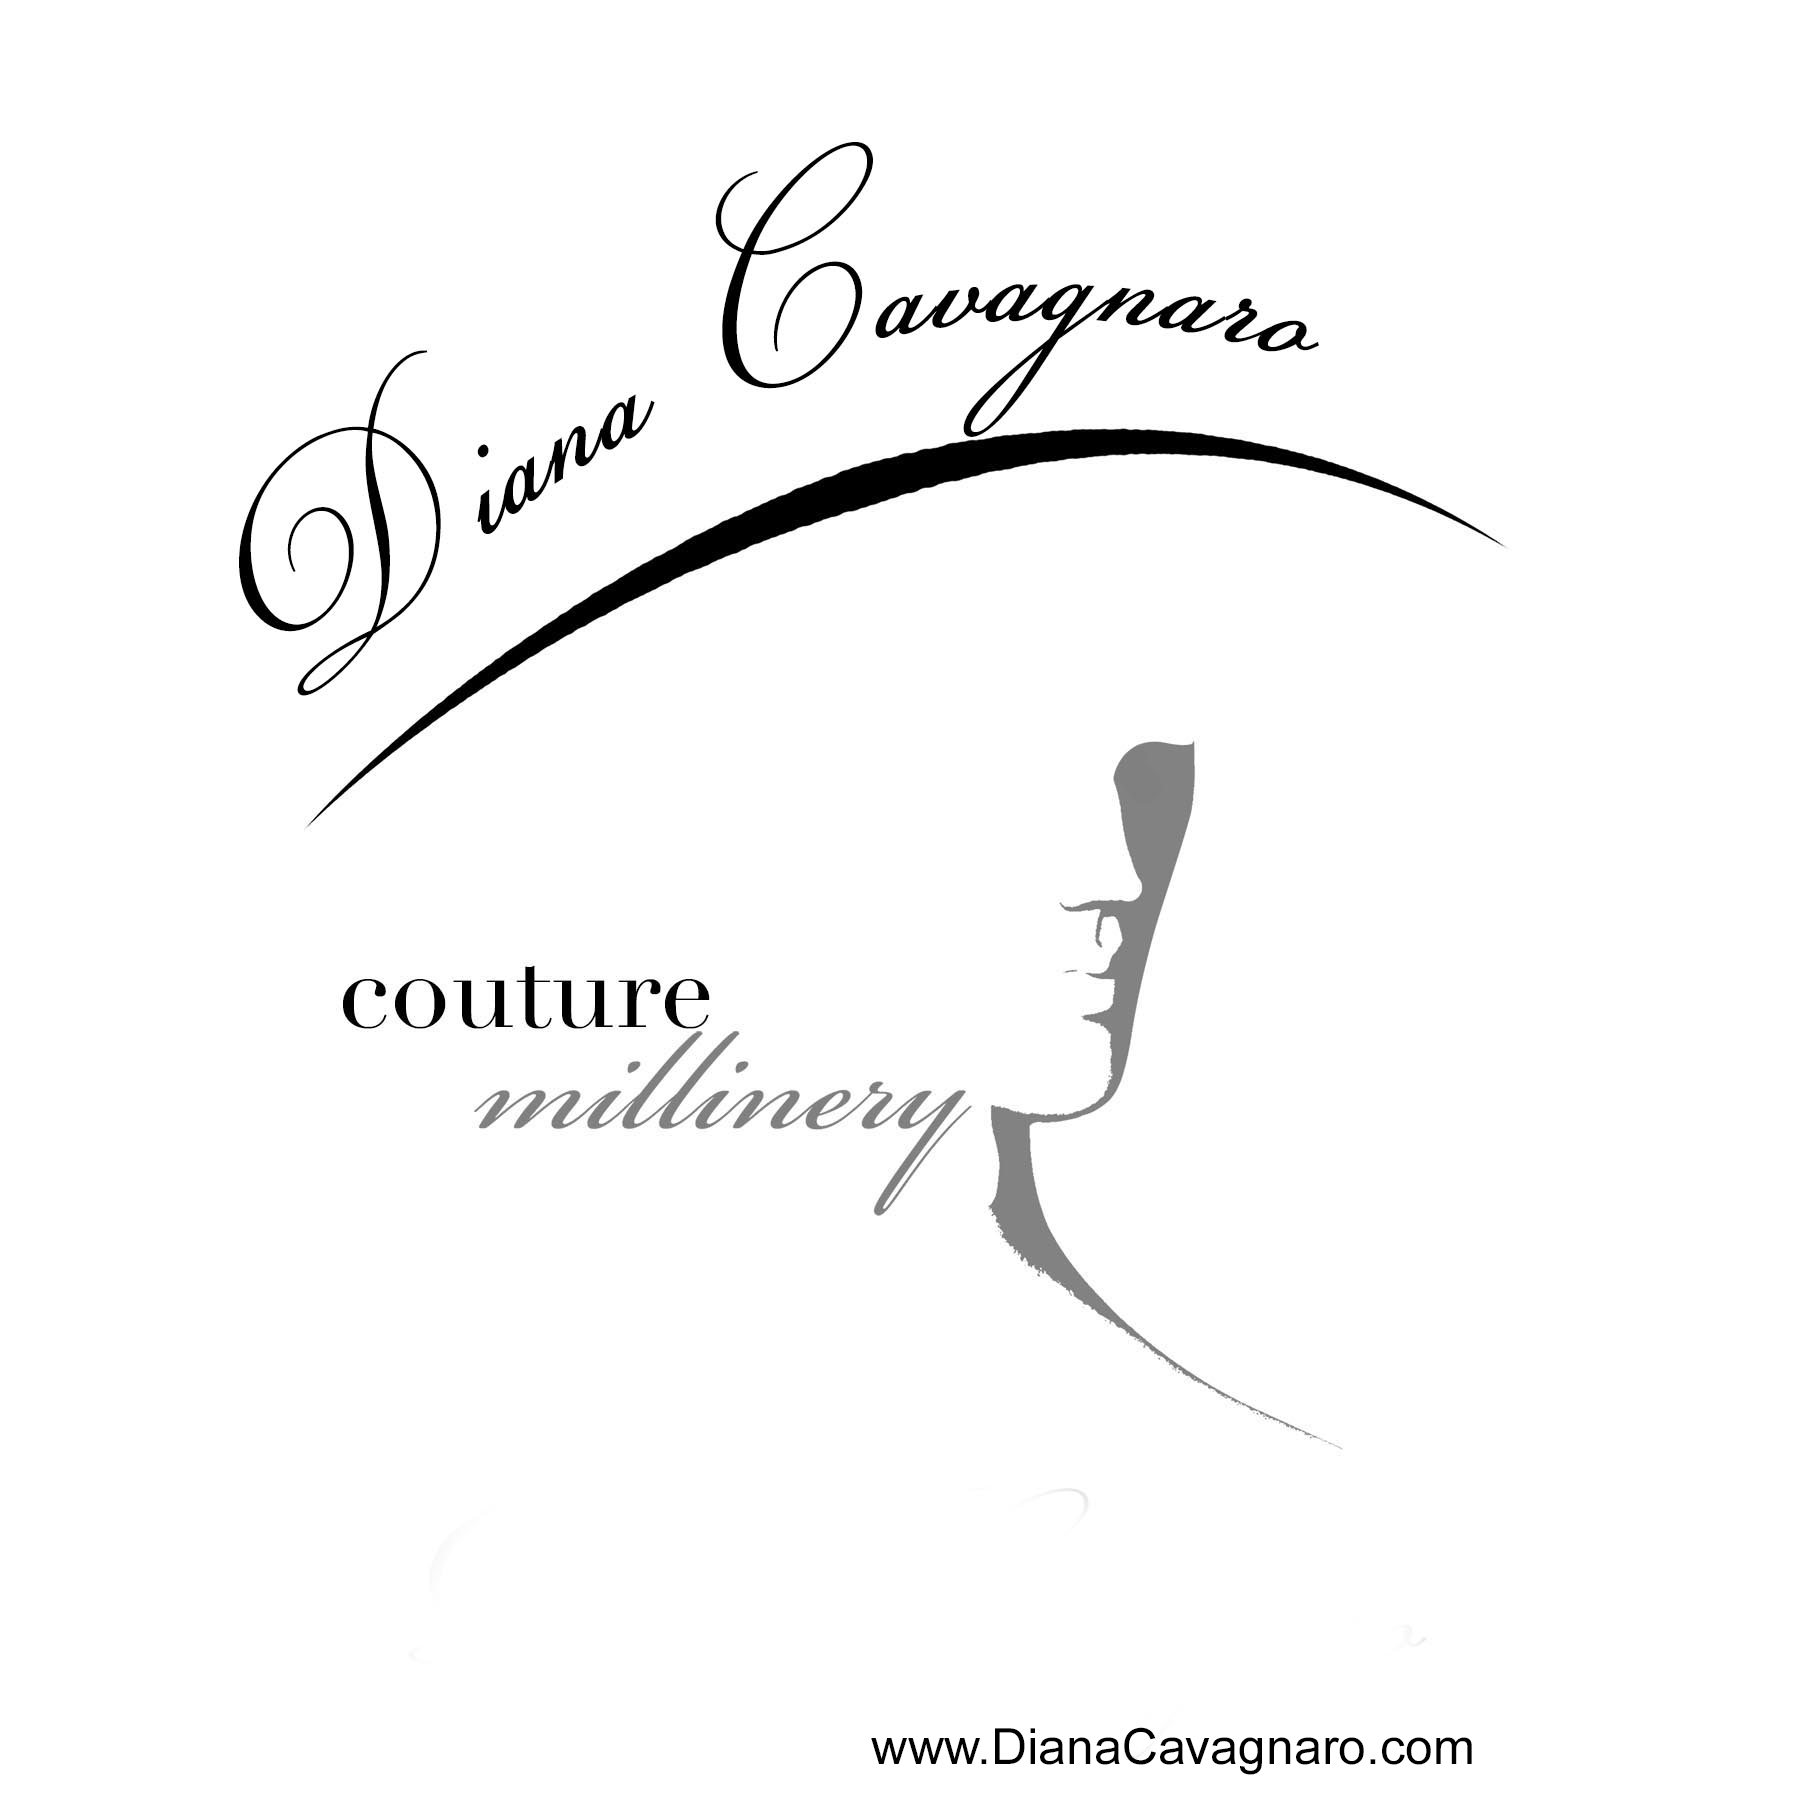 dianacavagnaro_logo.jpg